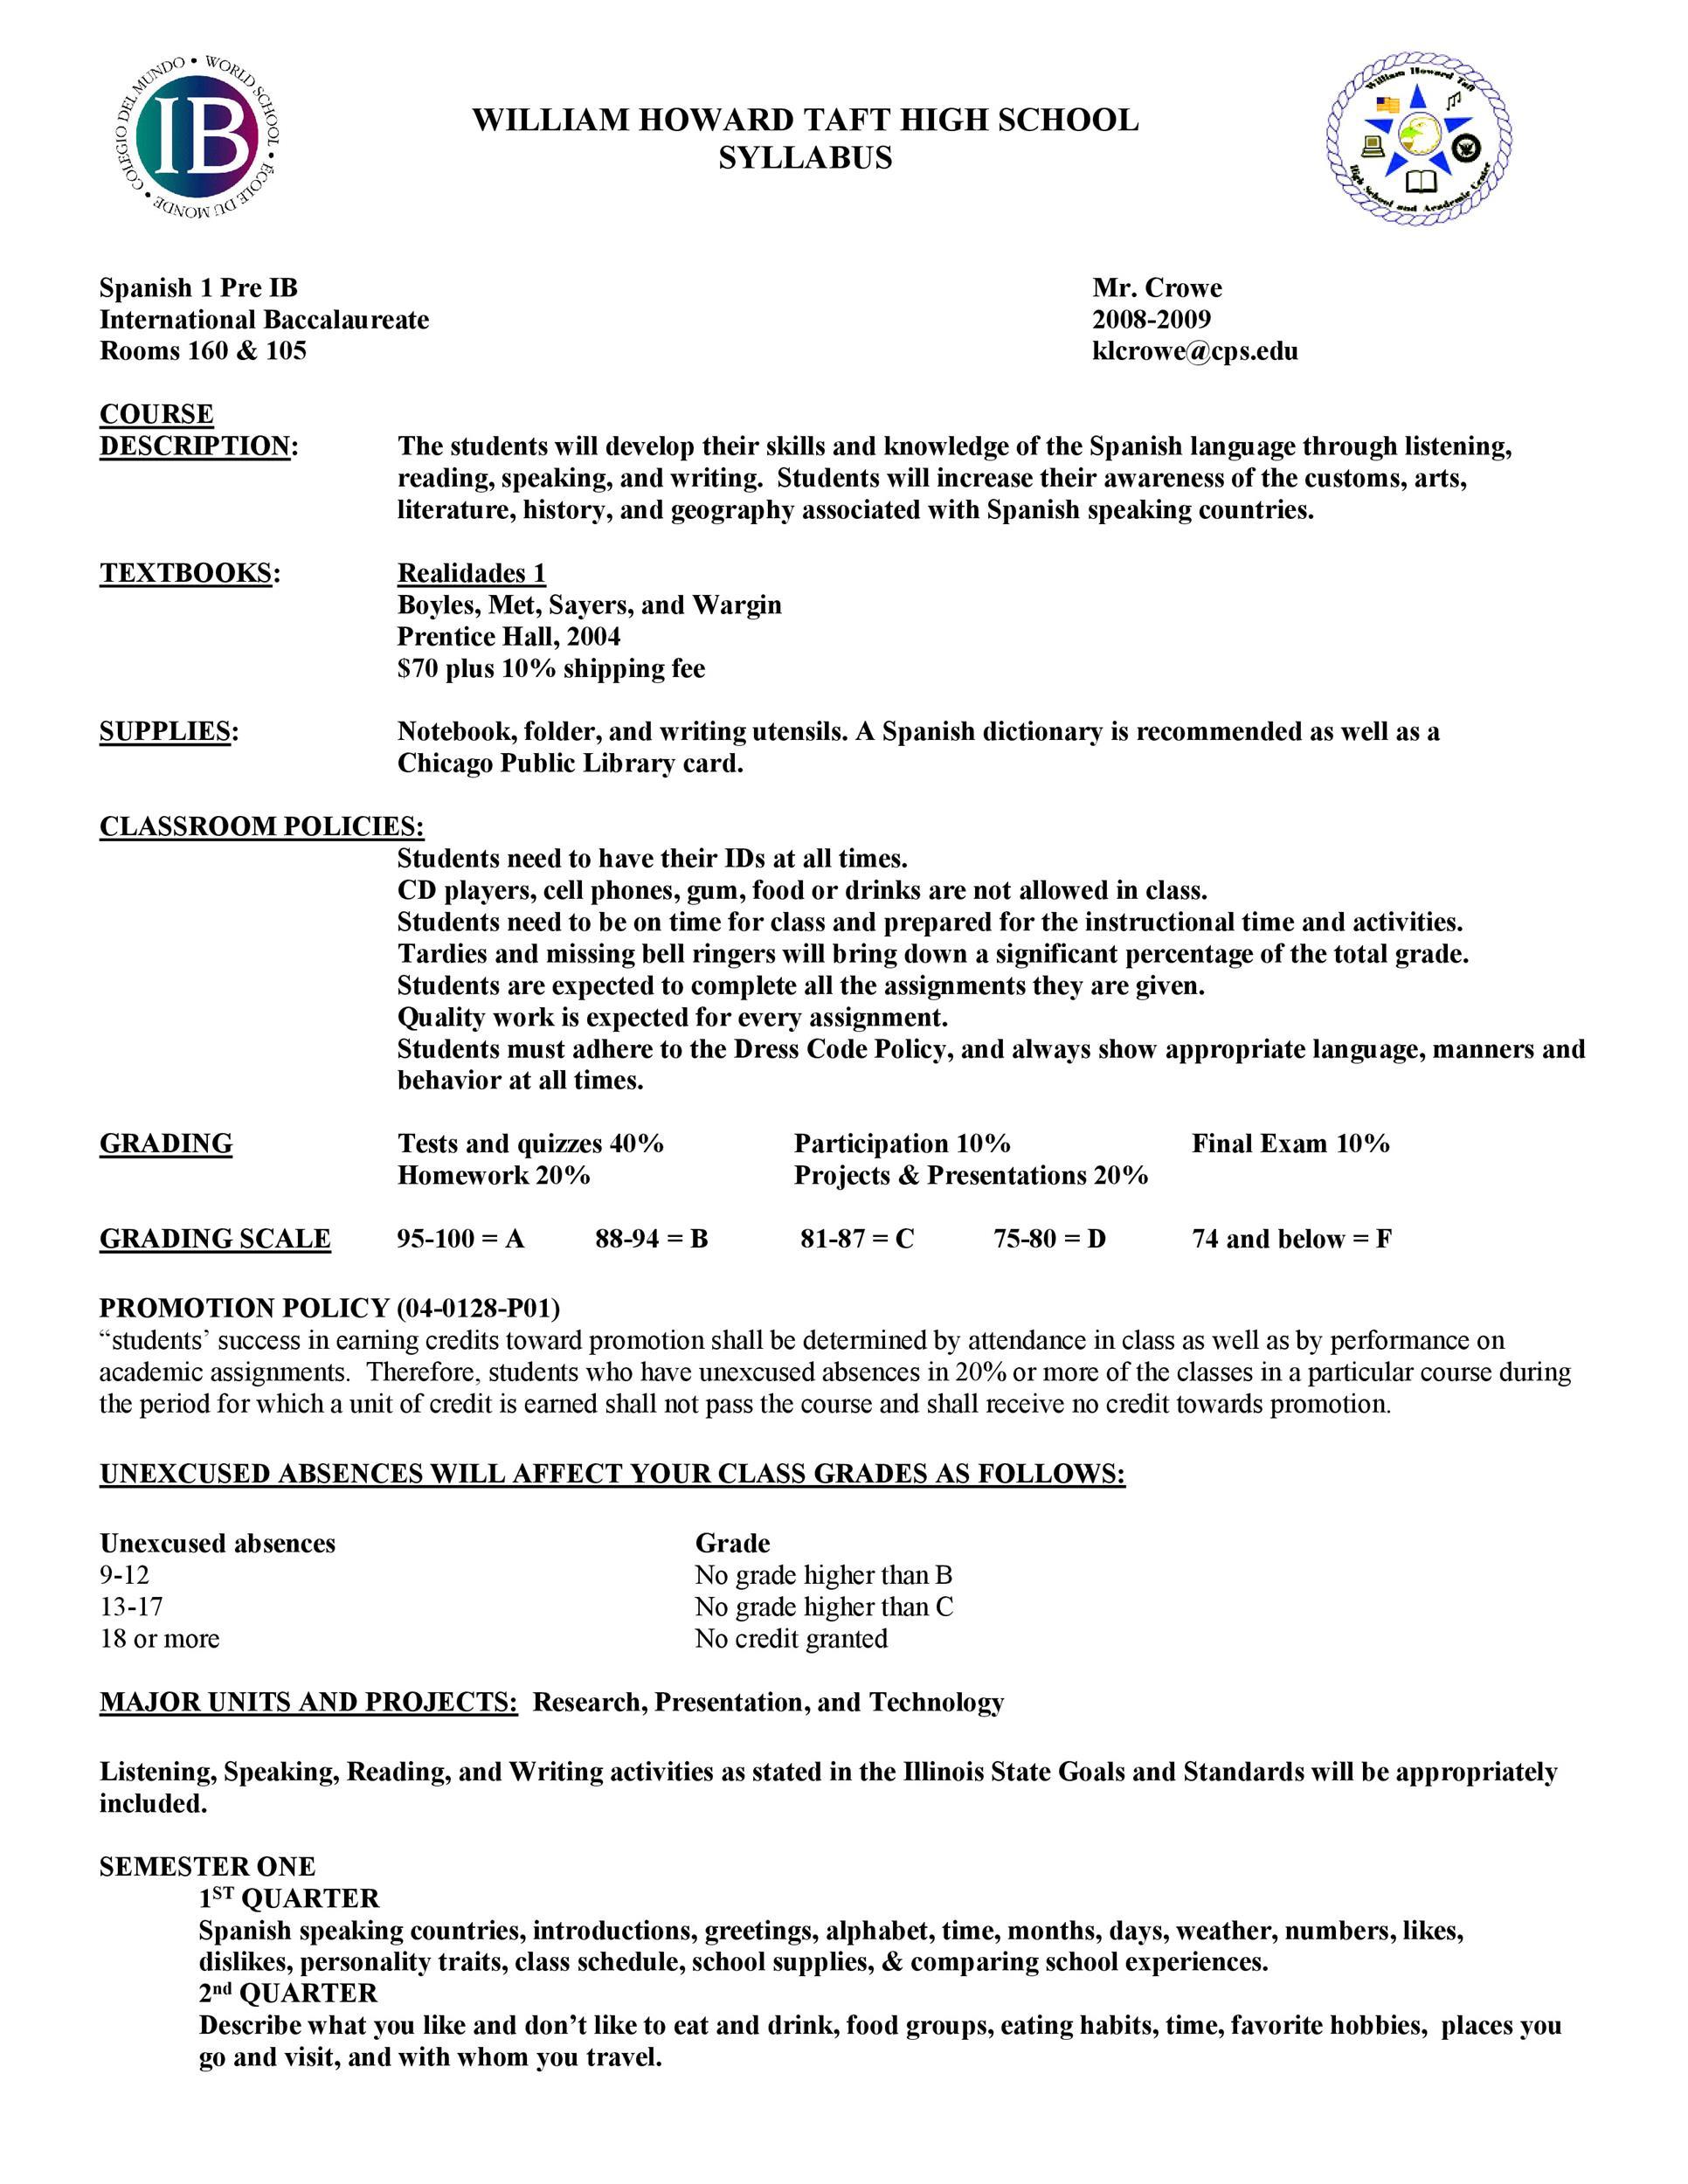 Free sylabus template 45